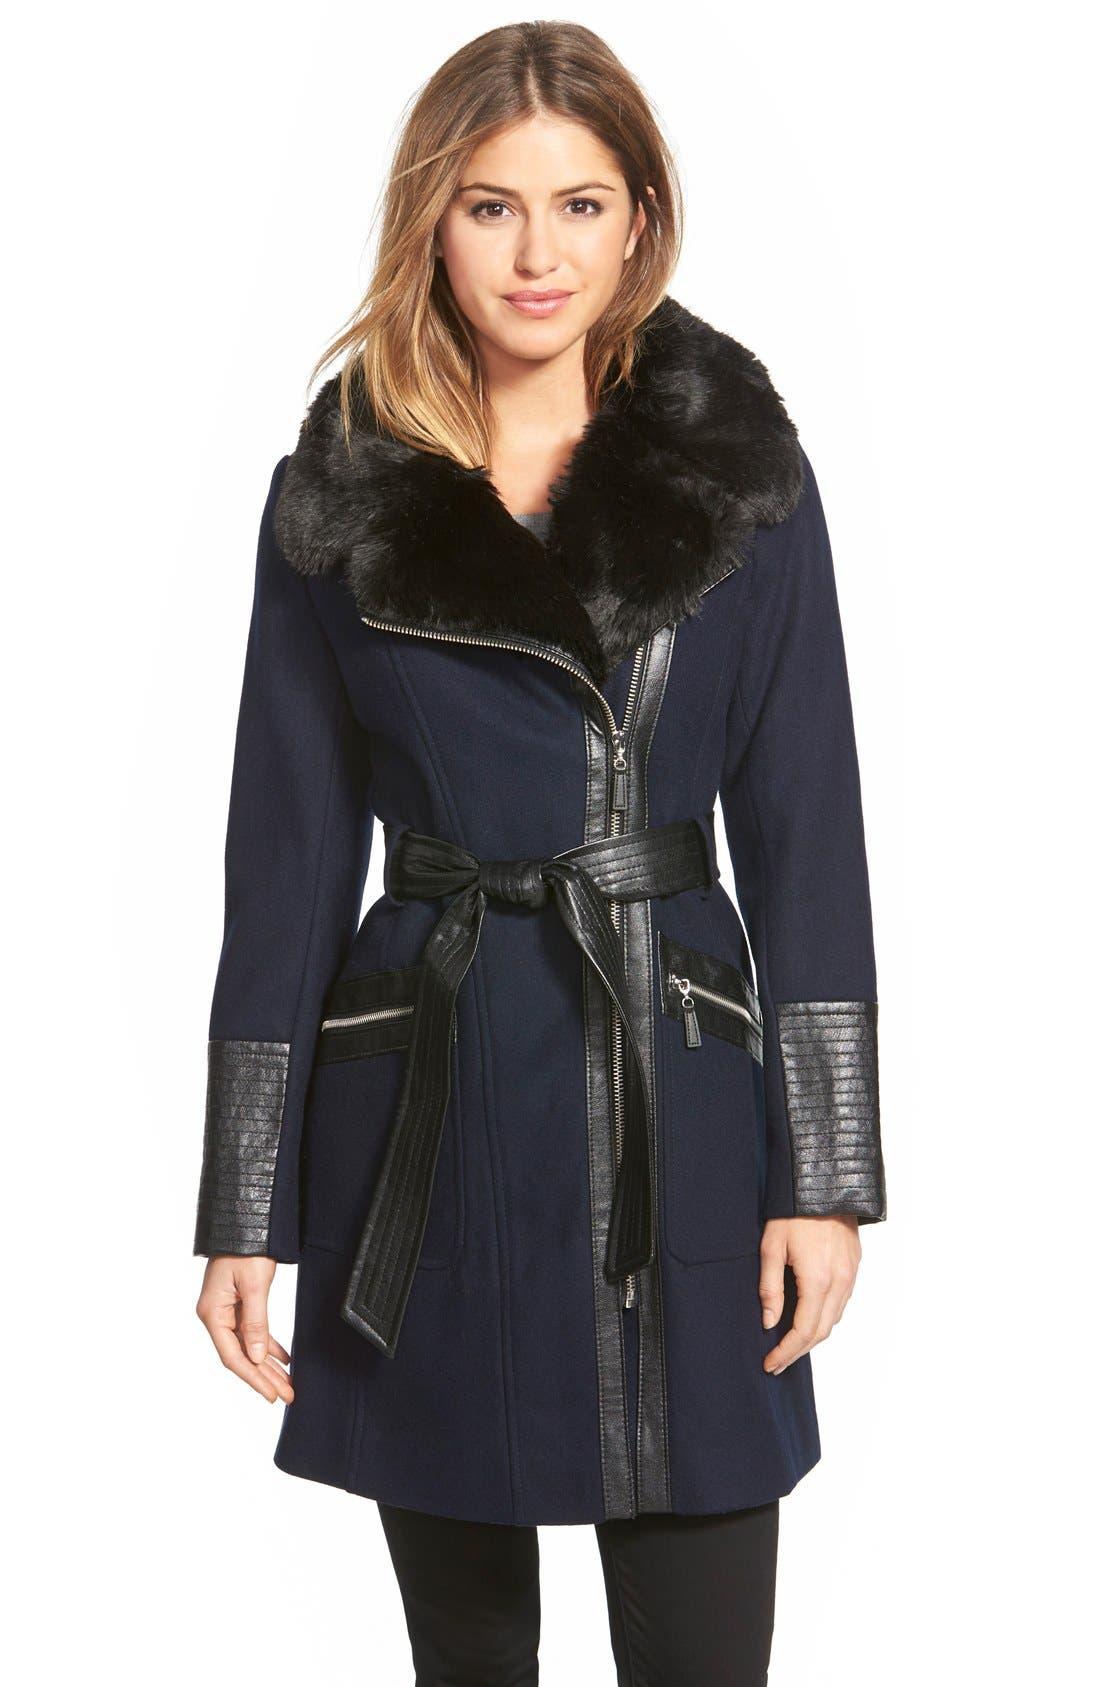 Alternate Image 1 Selected - Via Spiga Faux Leather & Faux Fur Trim Belted Wool Blend Coat